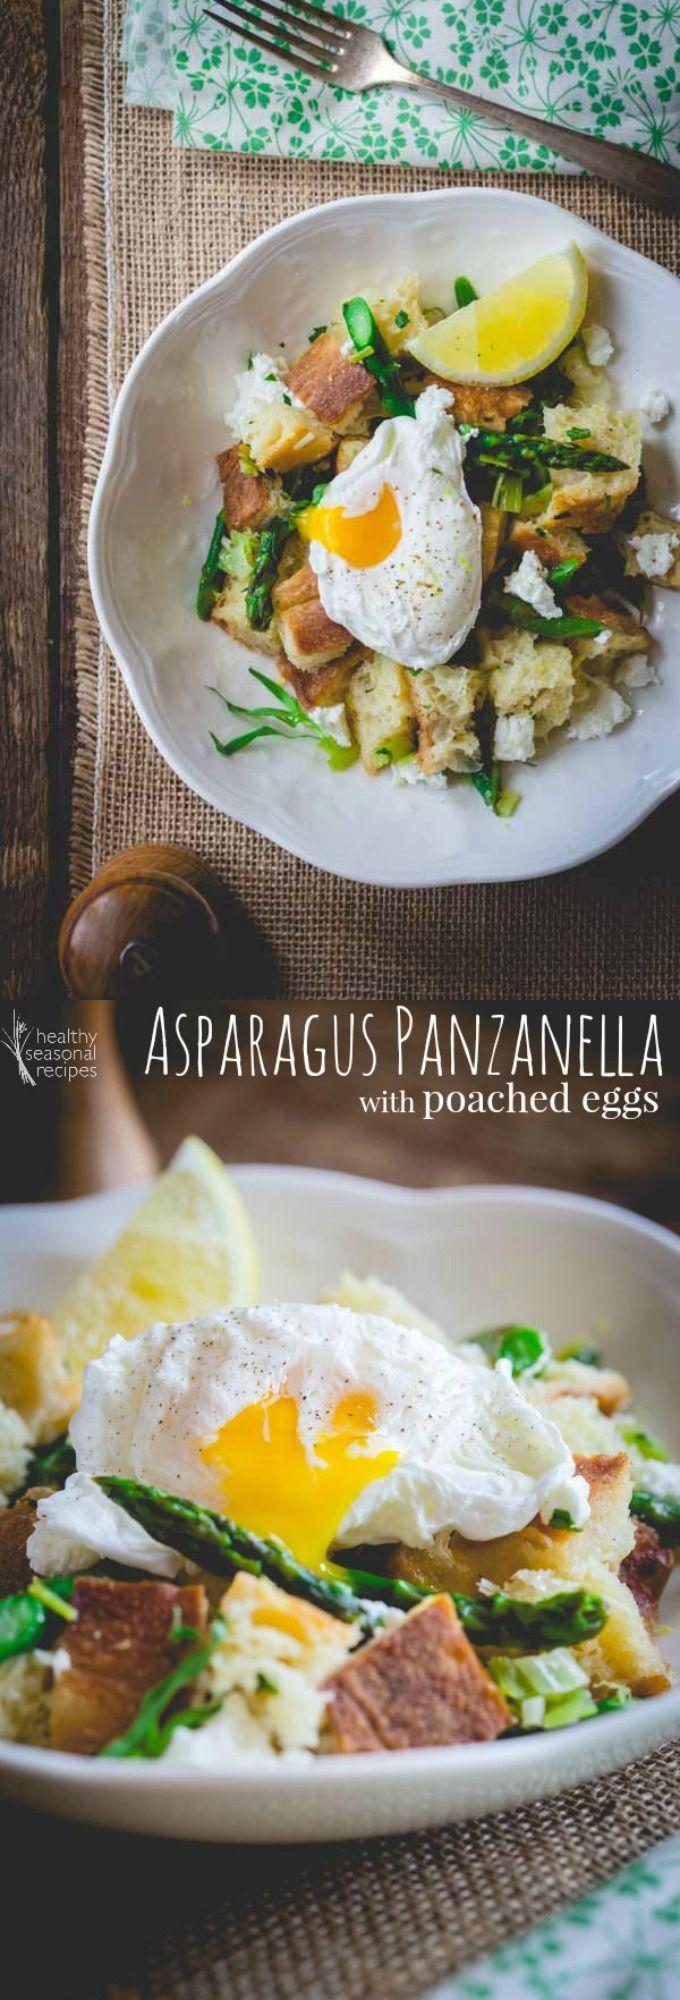 asparagus panzanella with poached eggs - Healthy Seasonal Recipes